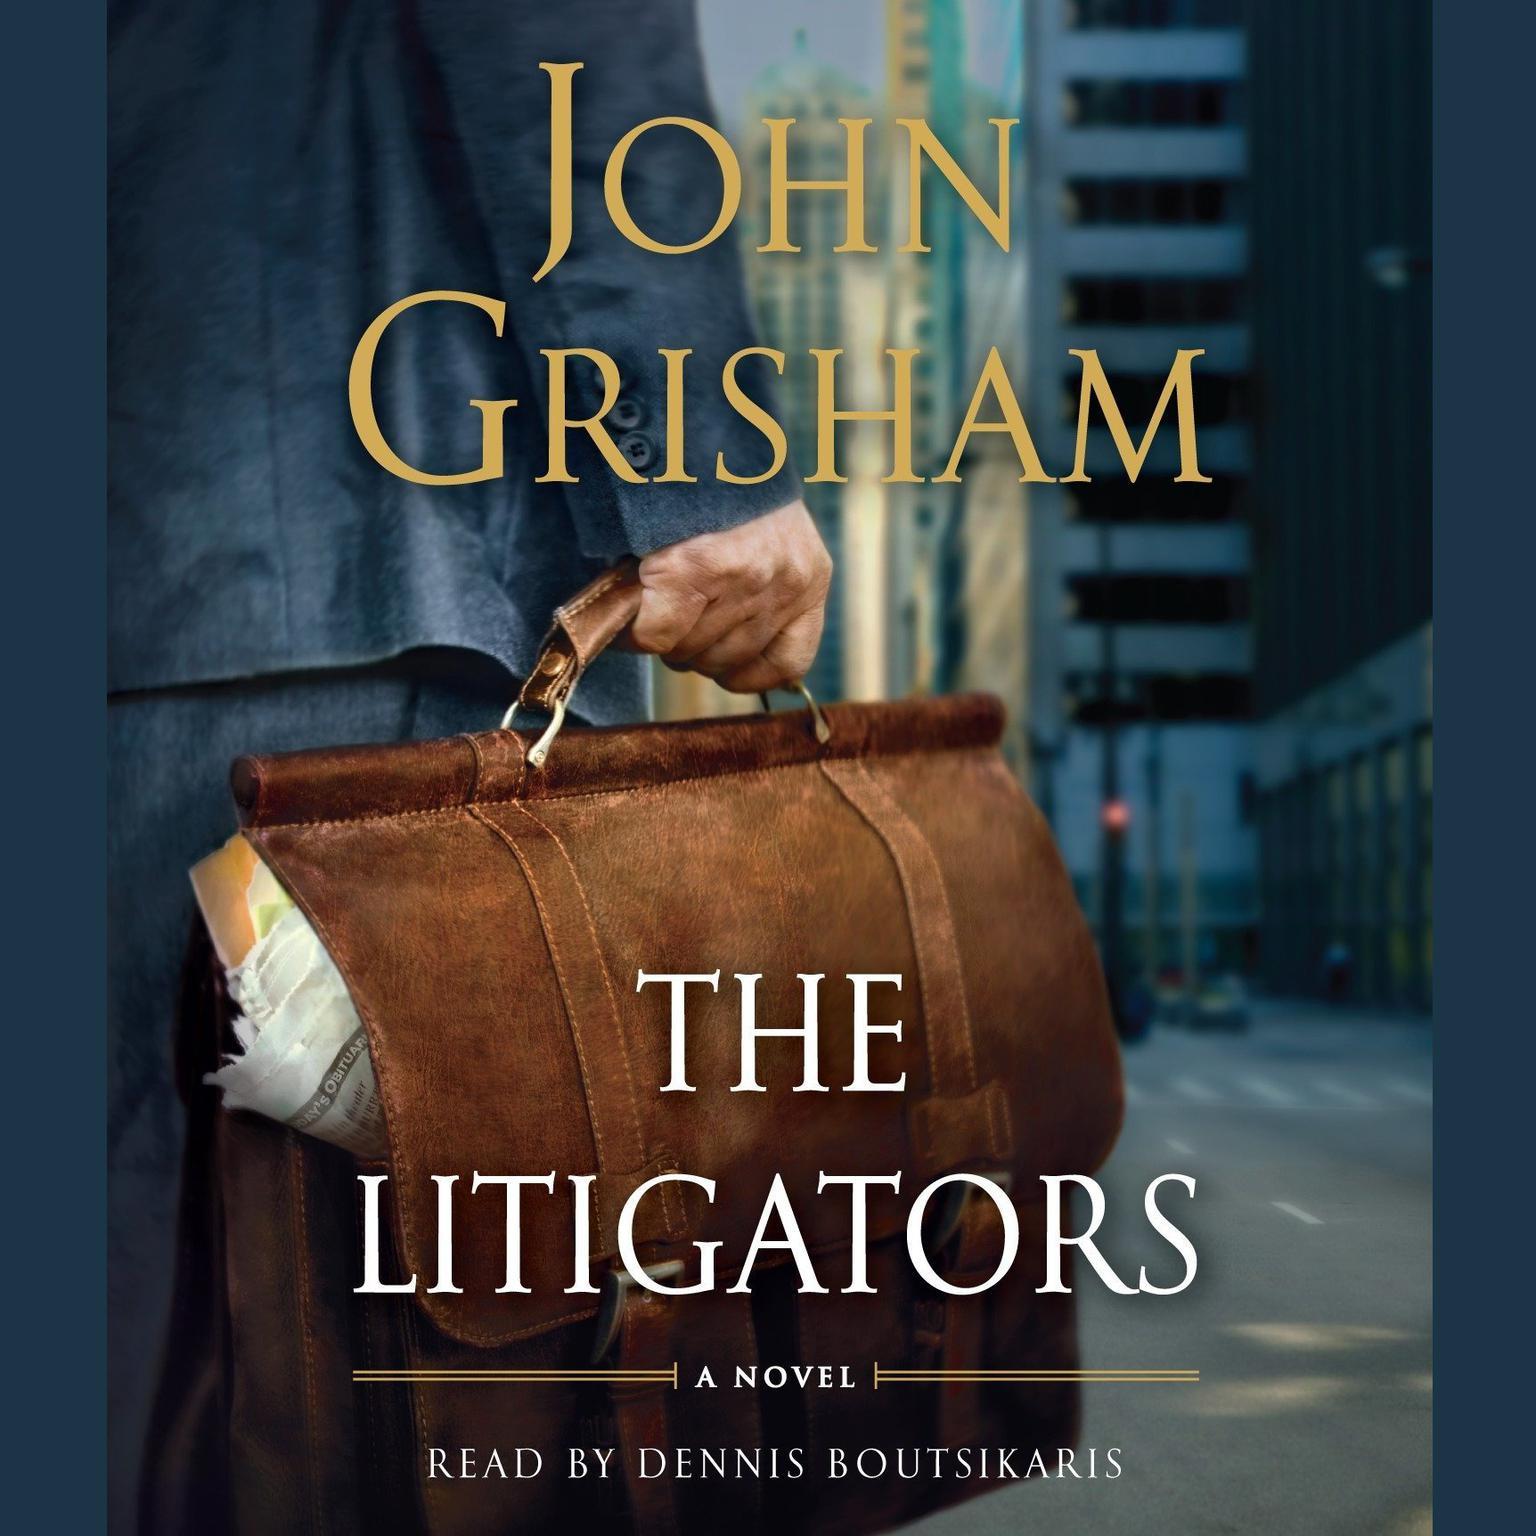 Printable The Litigators (Abridged) Audiobook Cover Art